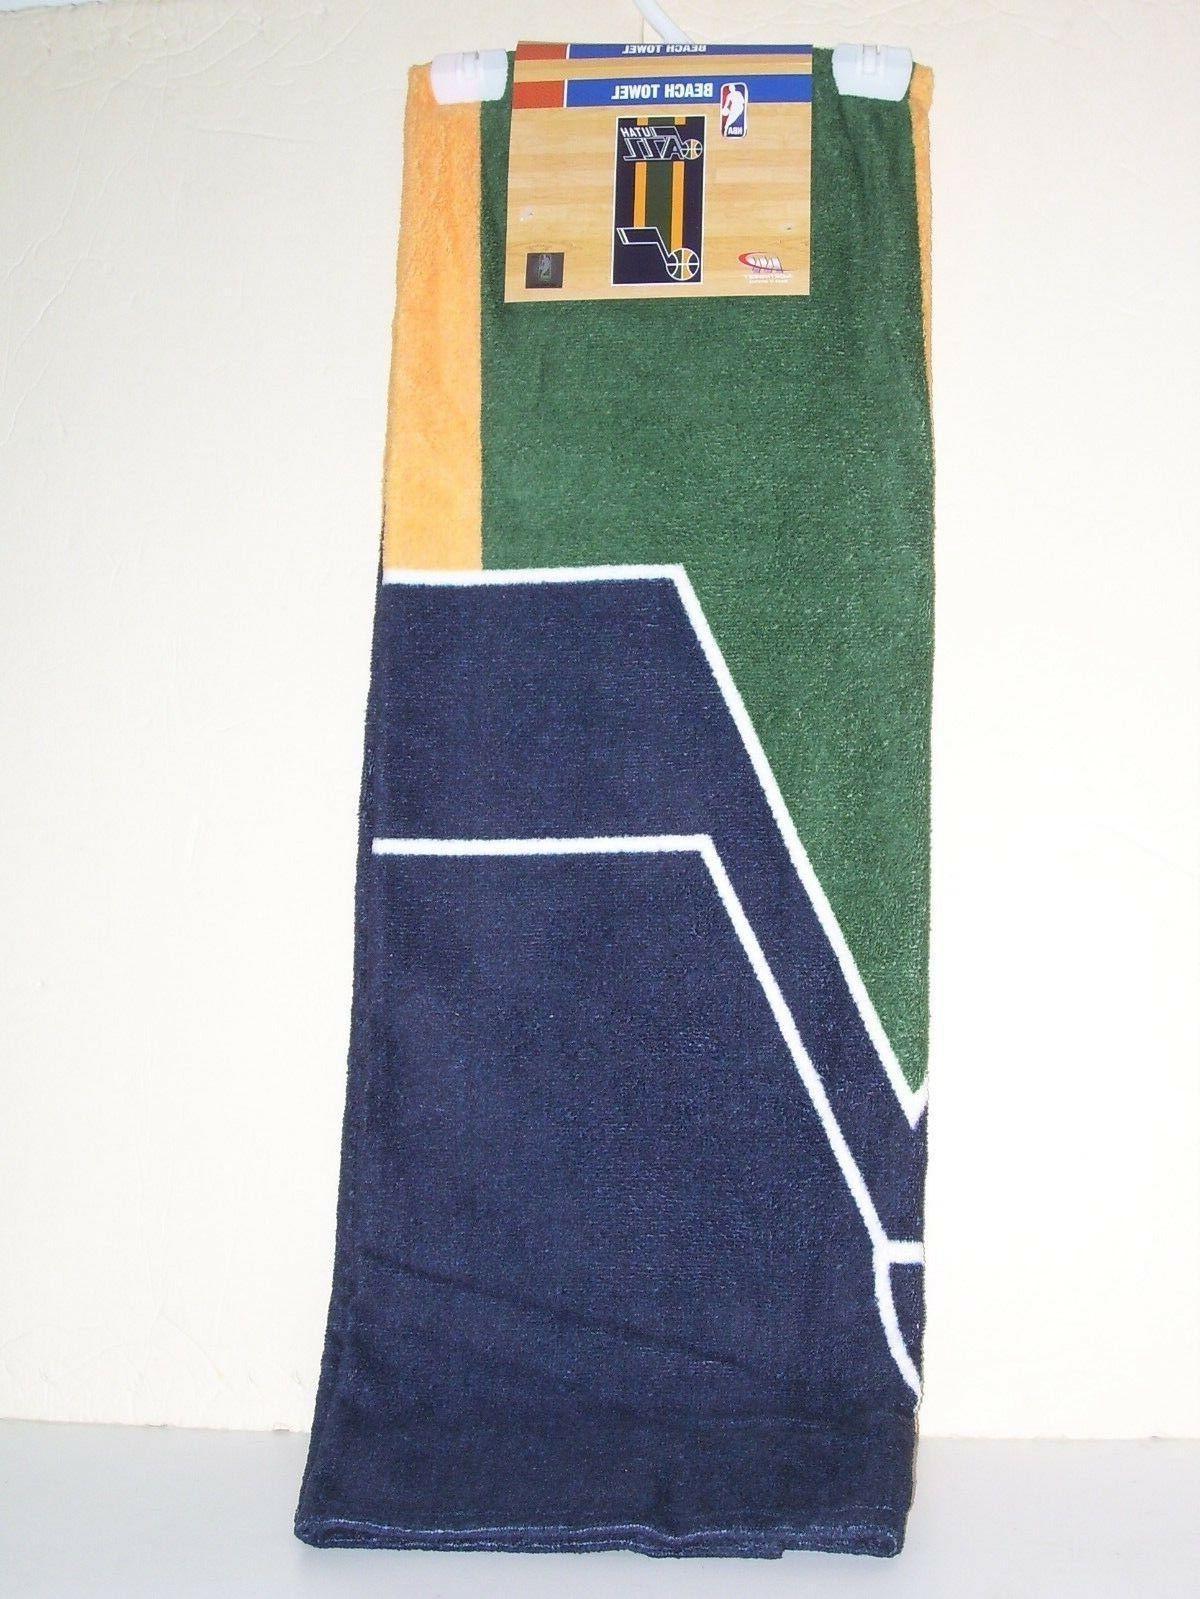 utah jazz beach towel green yellow blue